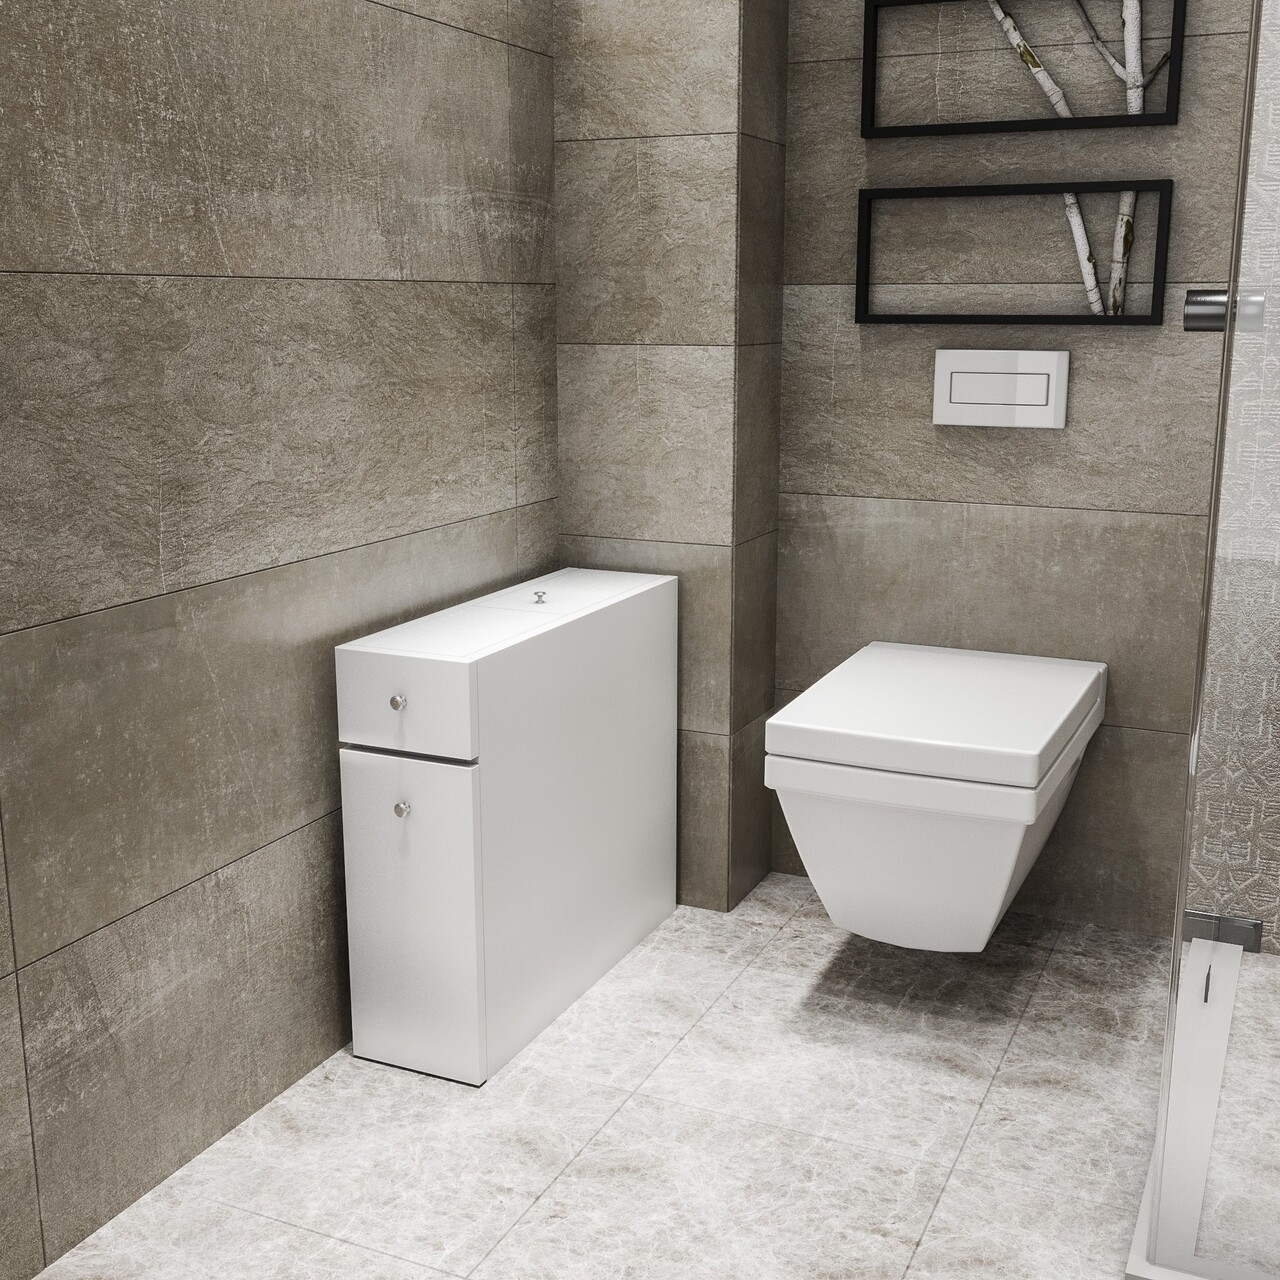 Dulap multifunctional pentru baie Calencia, Kalune Design, 19x60x55 cm, alb